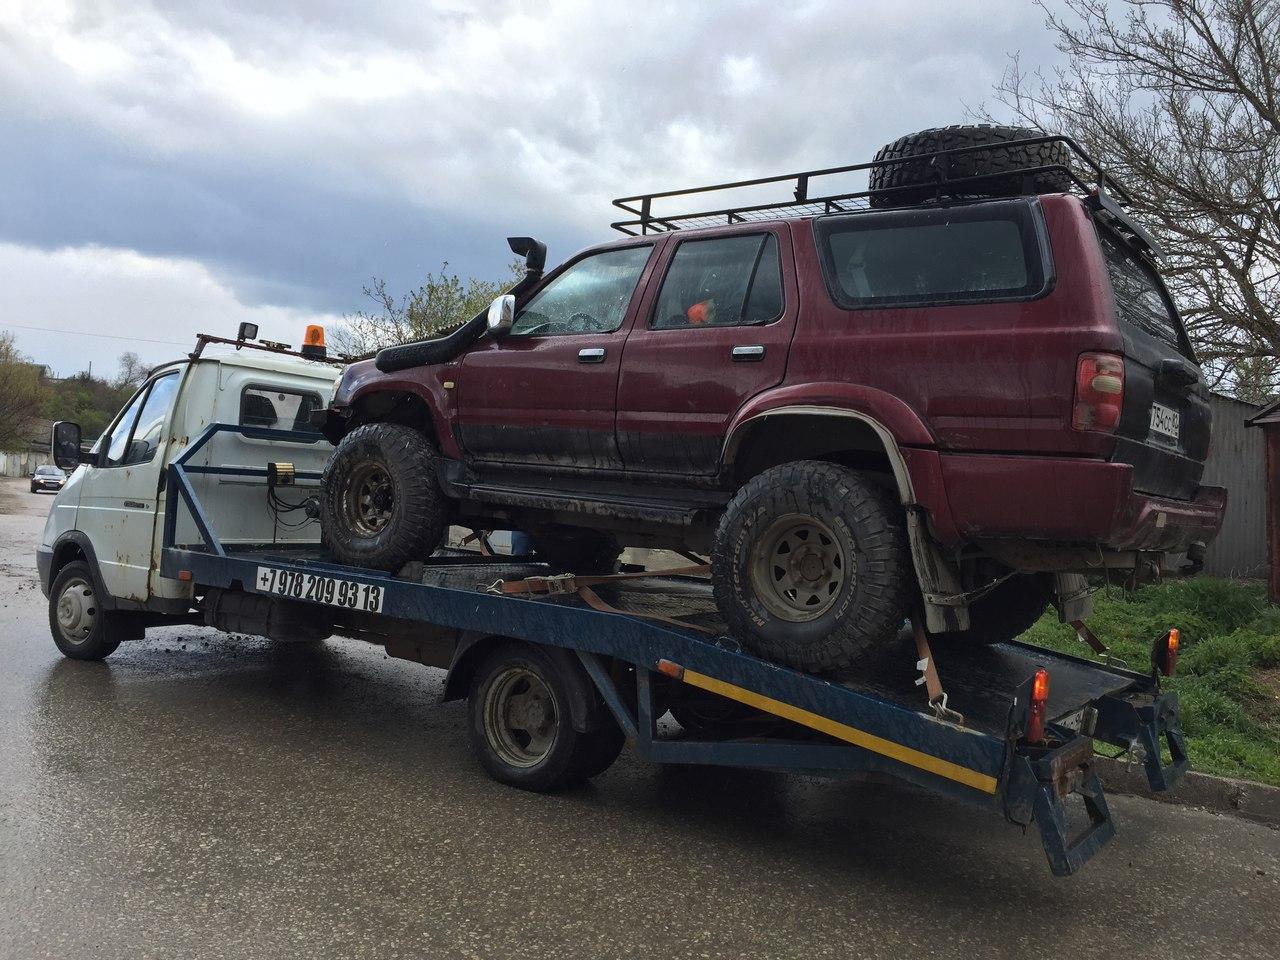 Фирма: Эвакуатор в Феодосии, Повелитель грузов